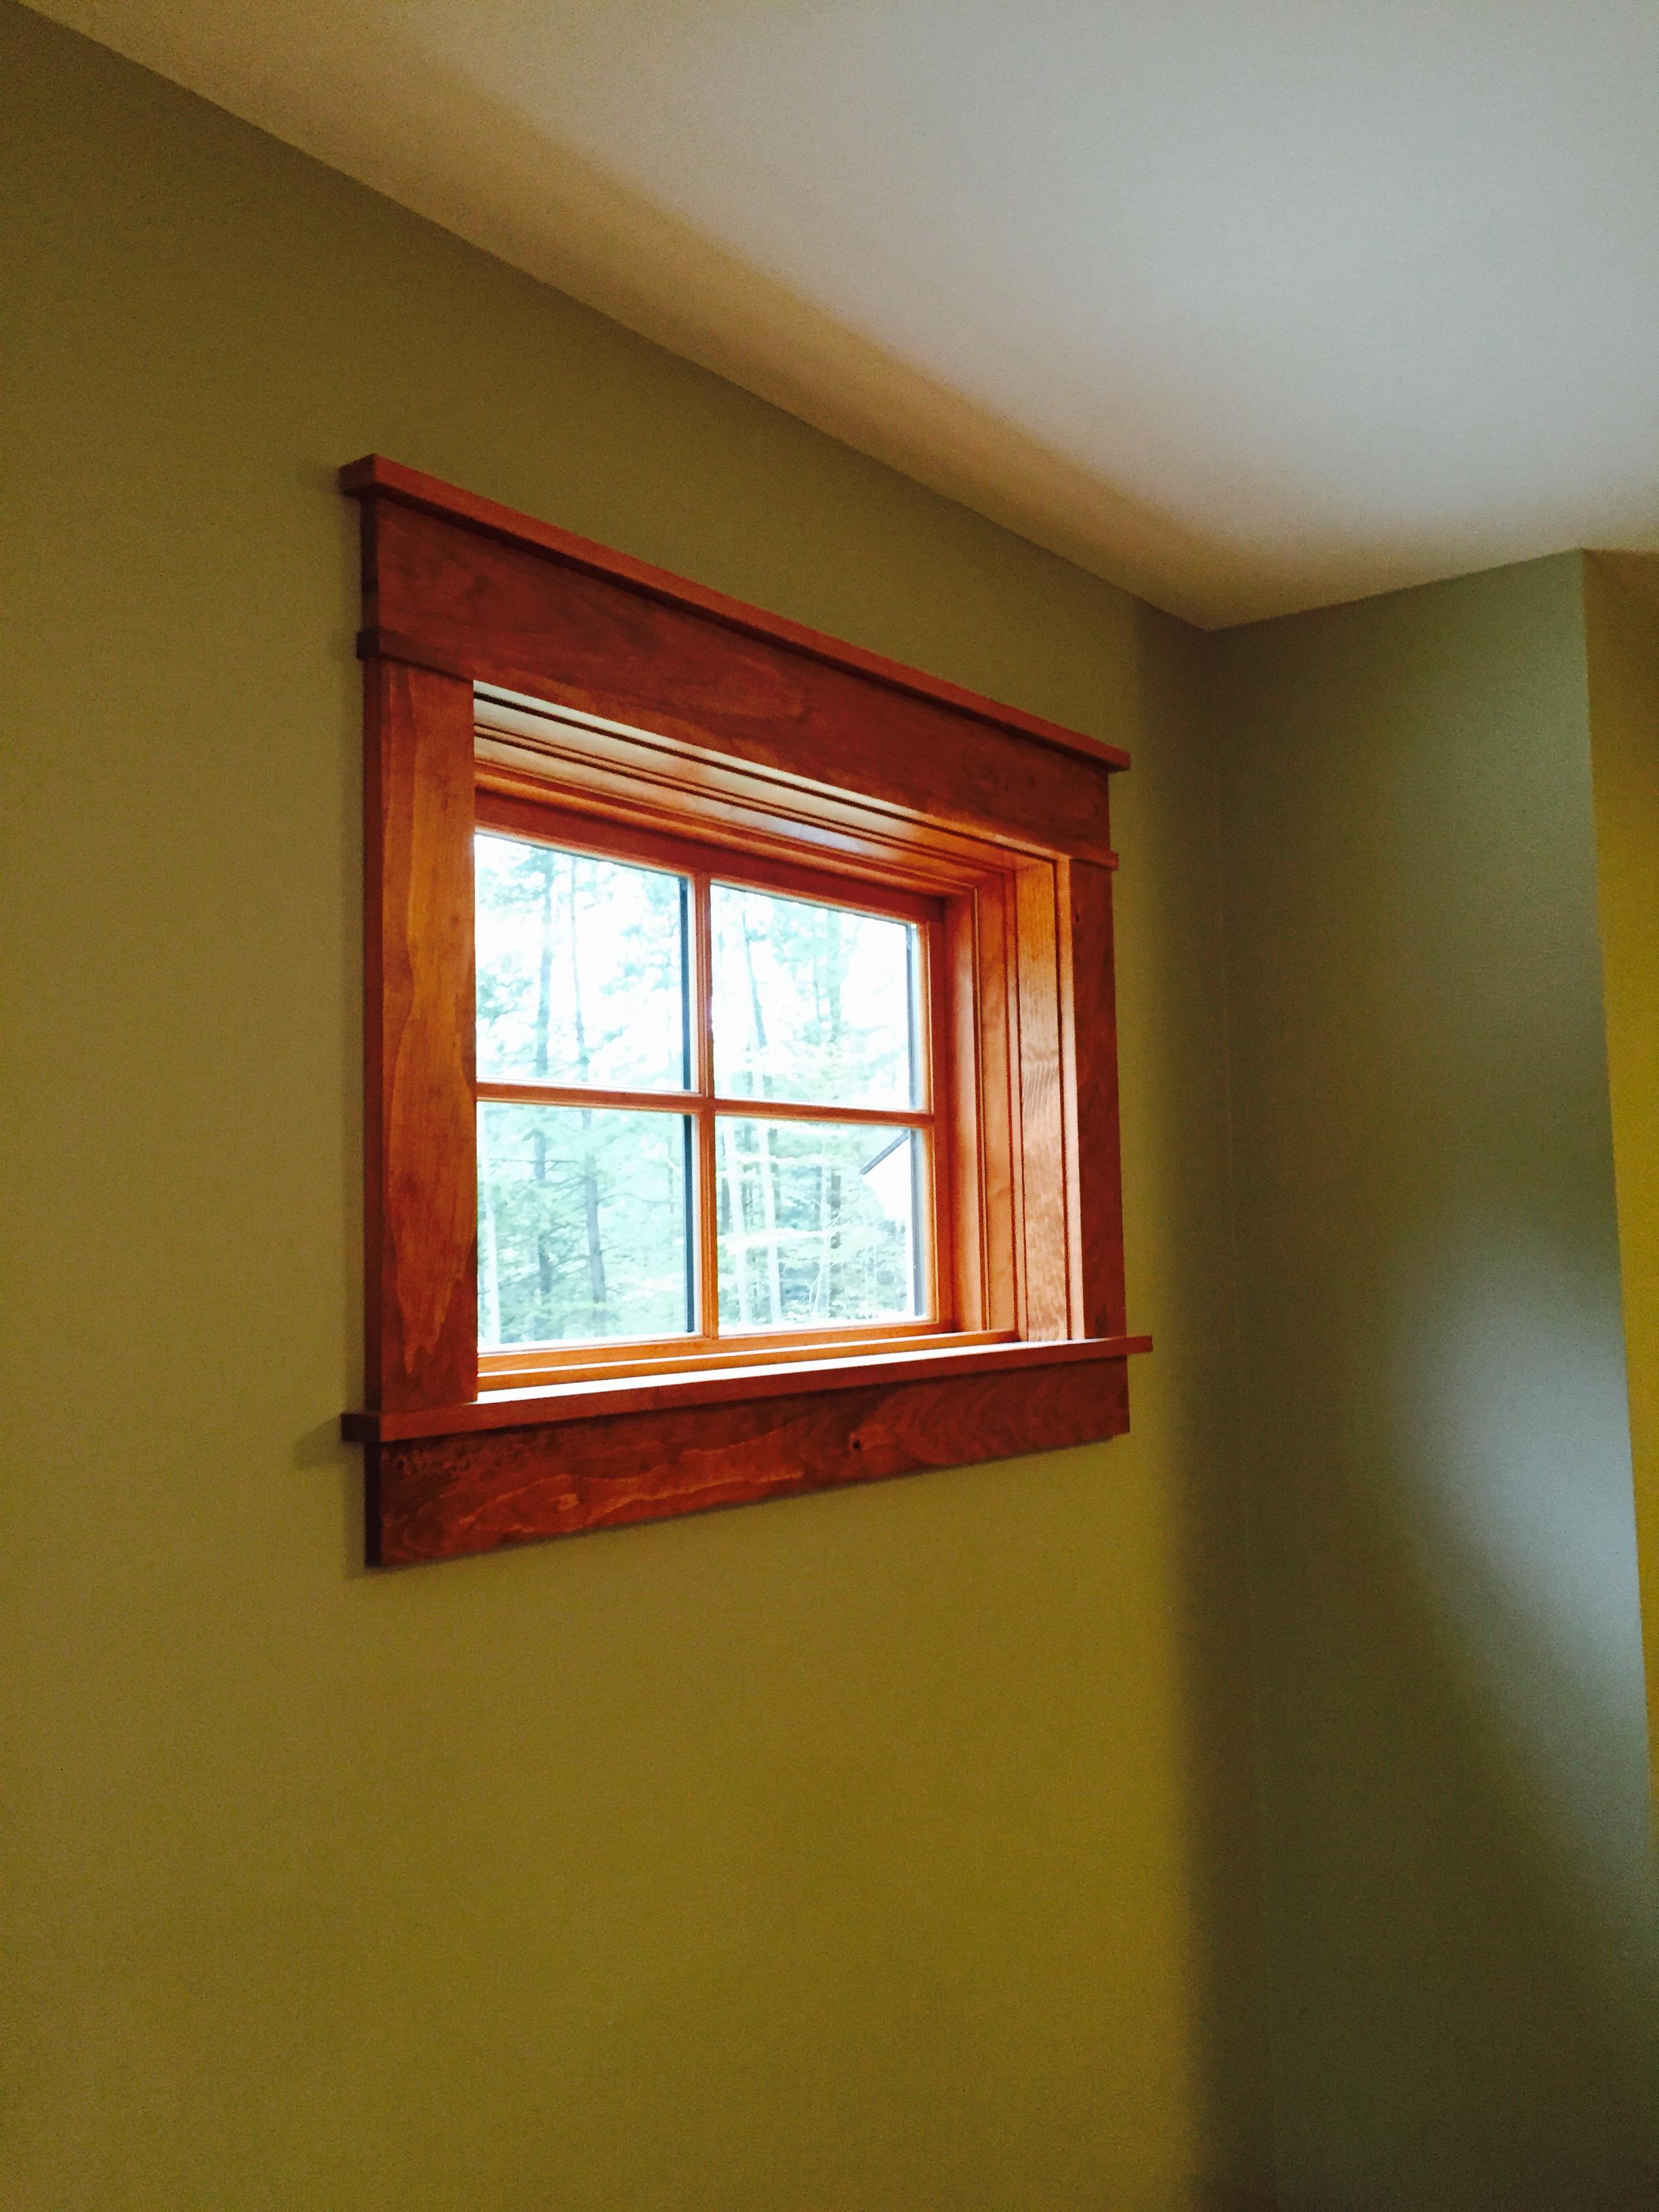 Marvin window and custom trim